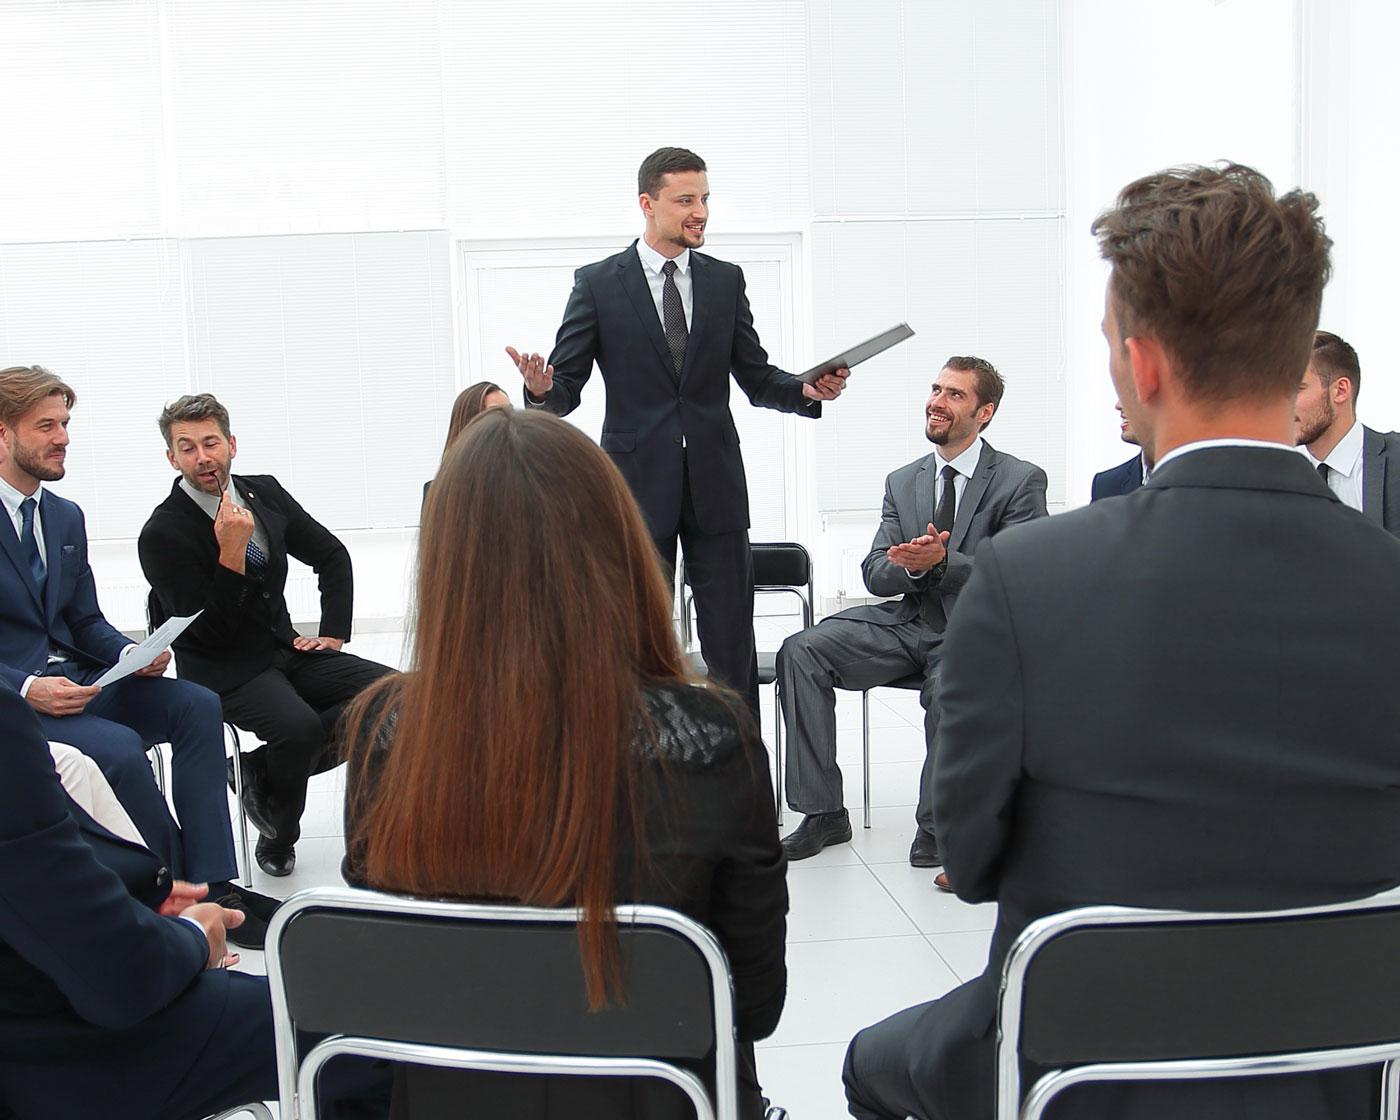 Equipo de personas en reunión con coach